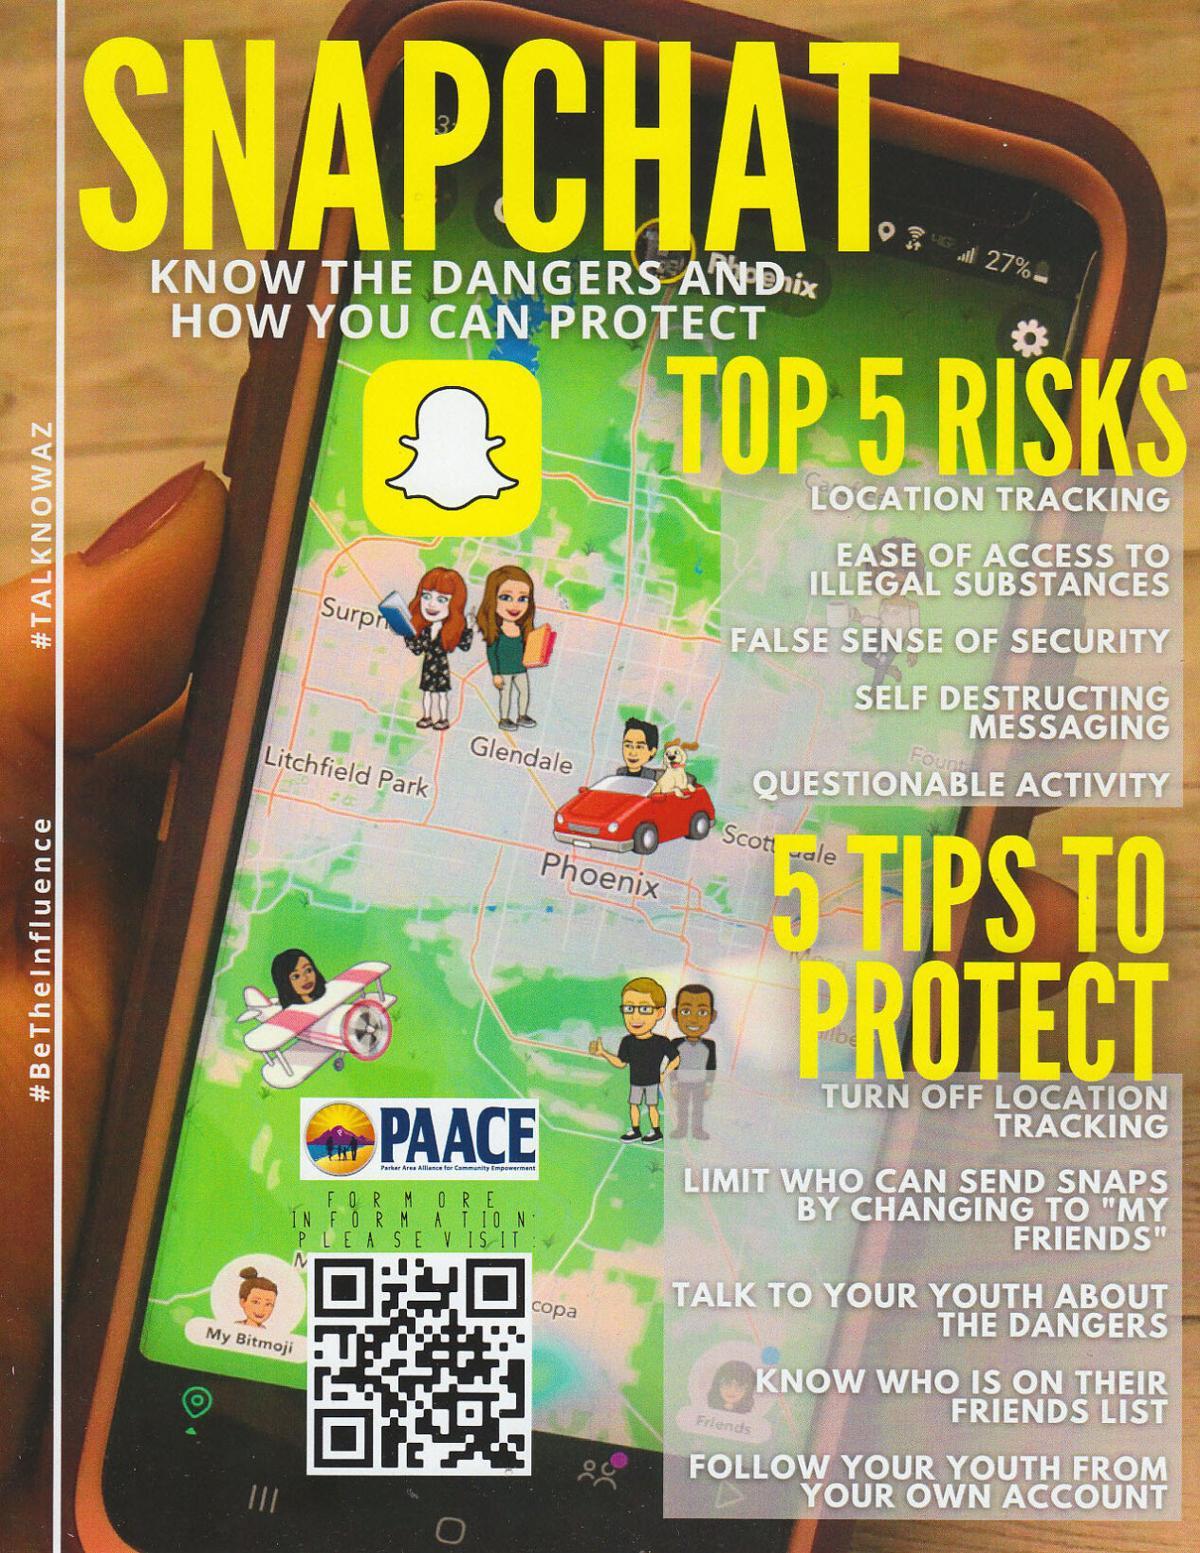 PAACE and Snapchat